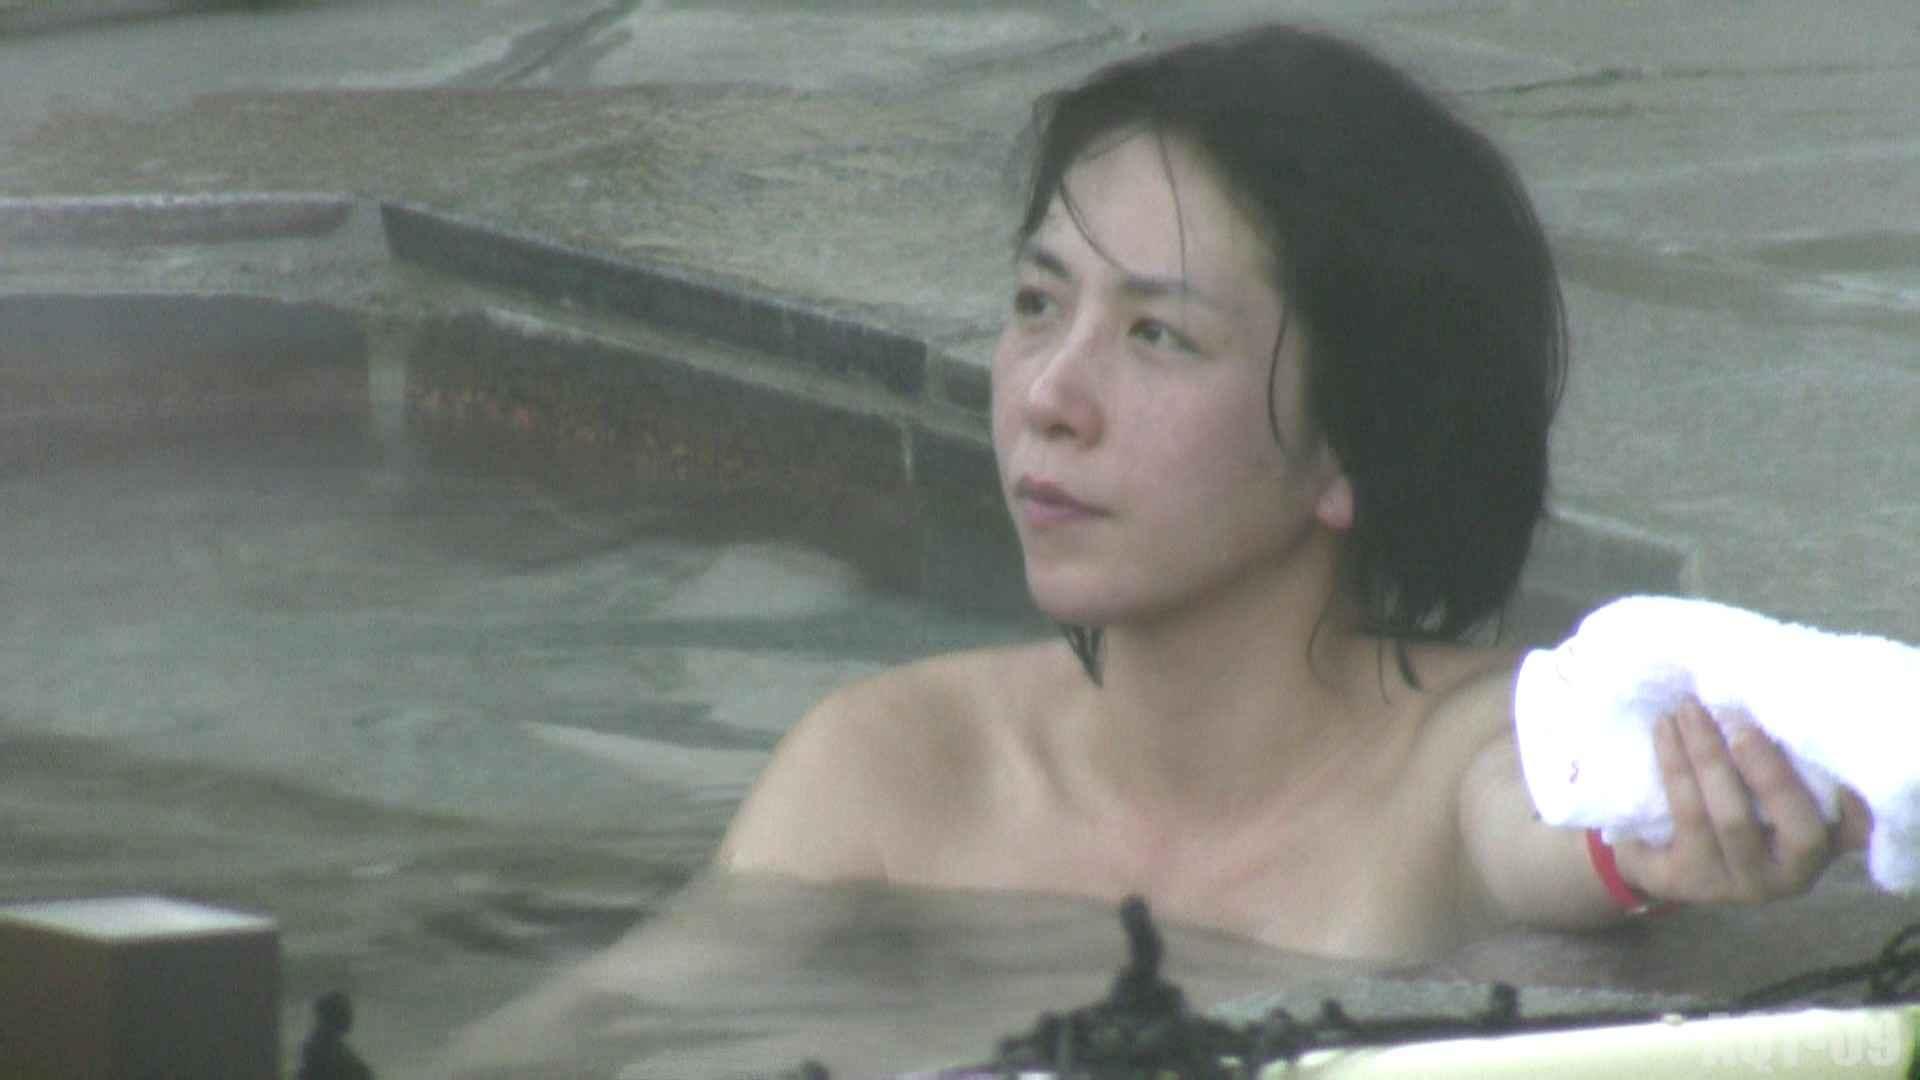 Aquaな露天風呂Vol.788 盗撮師作品  100pic 36